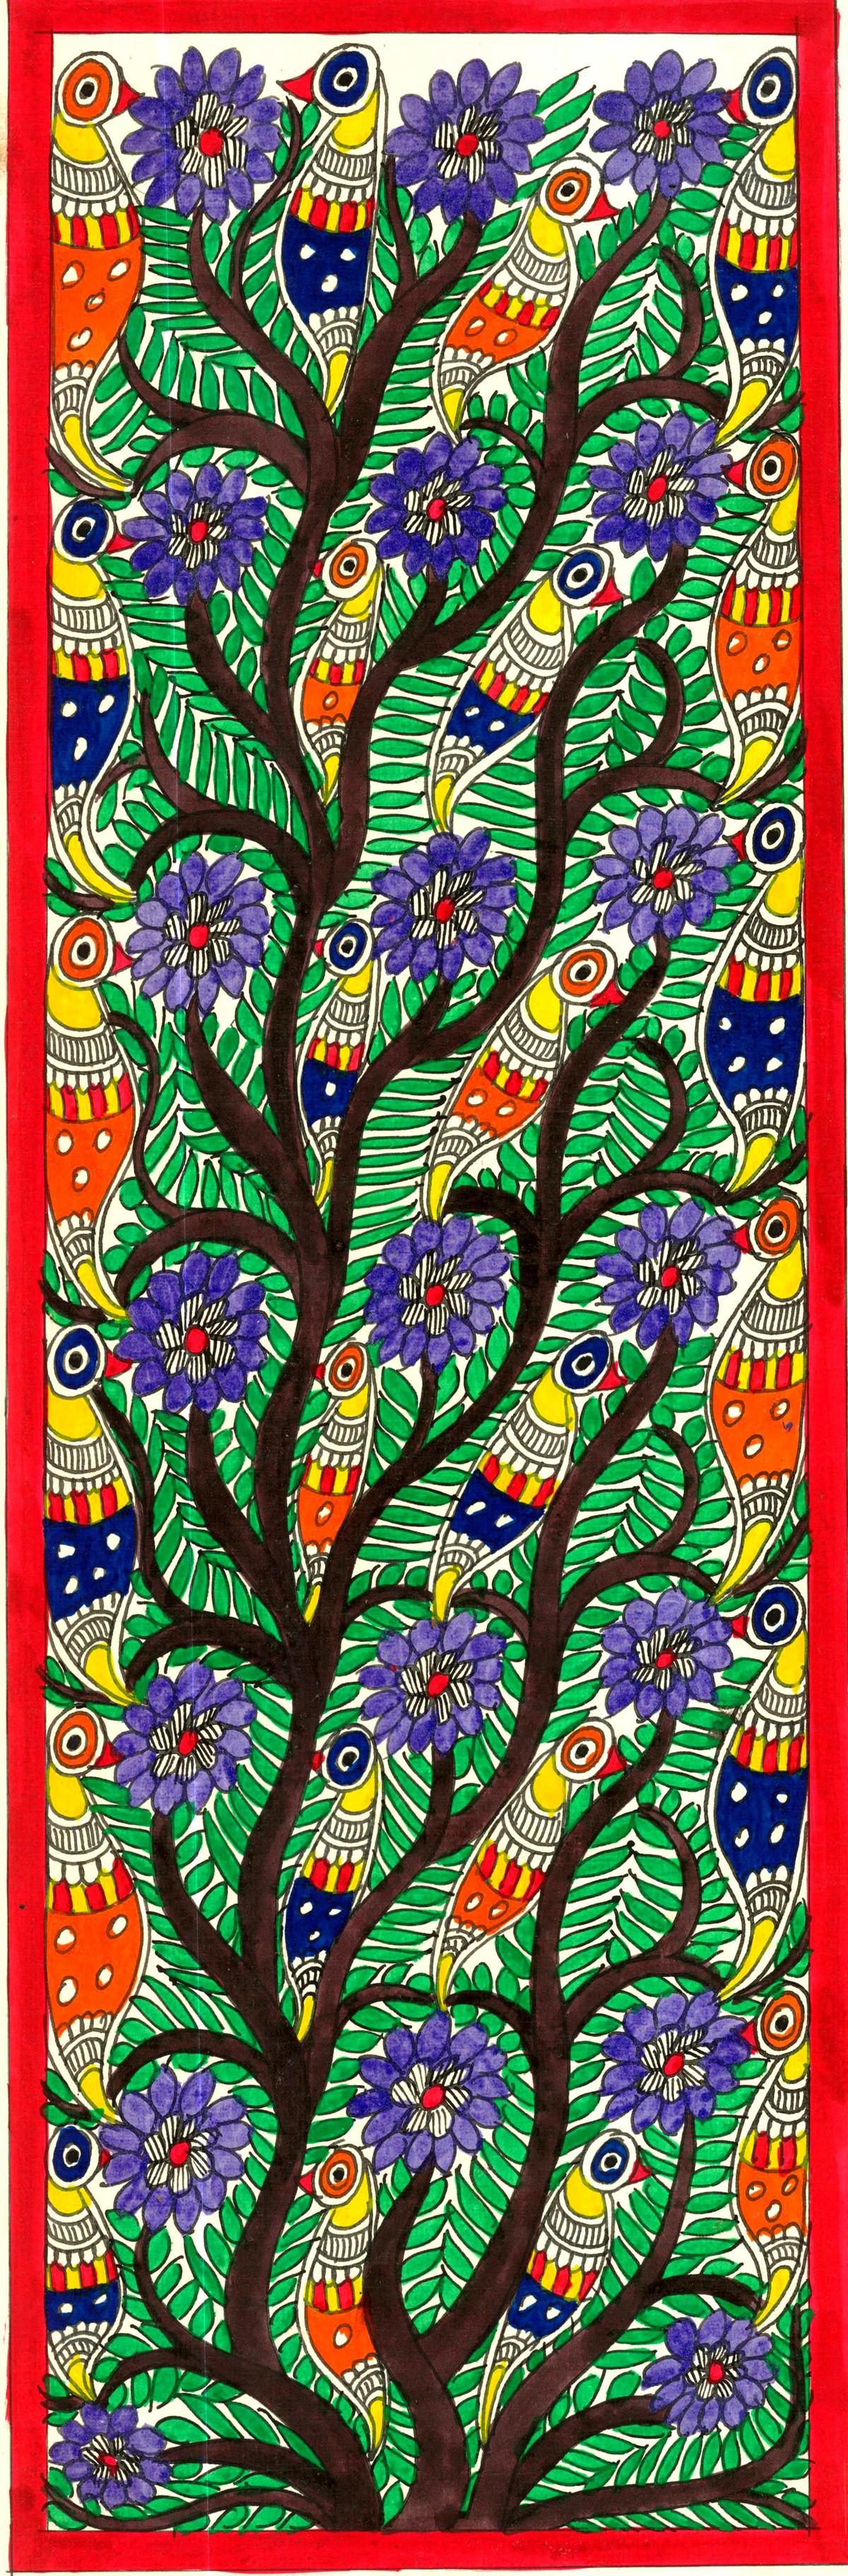 Tree of Life by artist Unknown Artist – Folk, Drawing | Mojarto | 256253